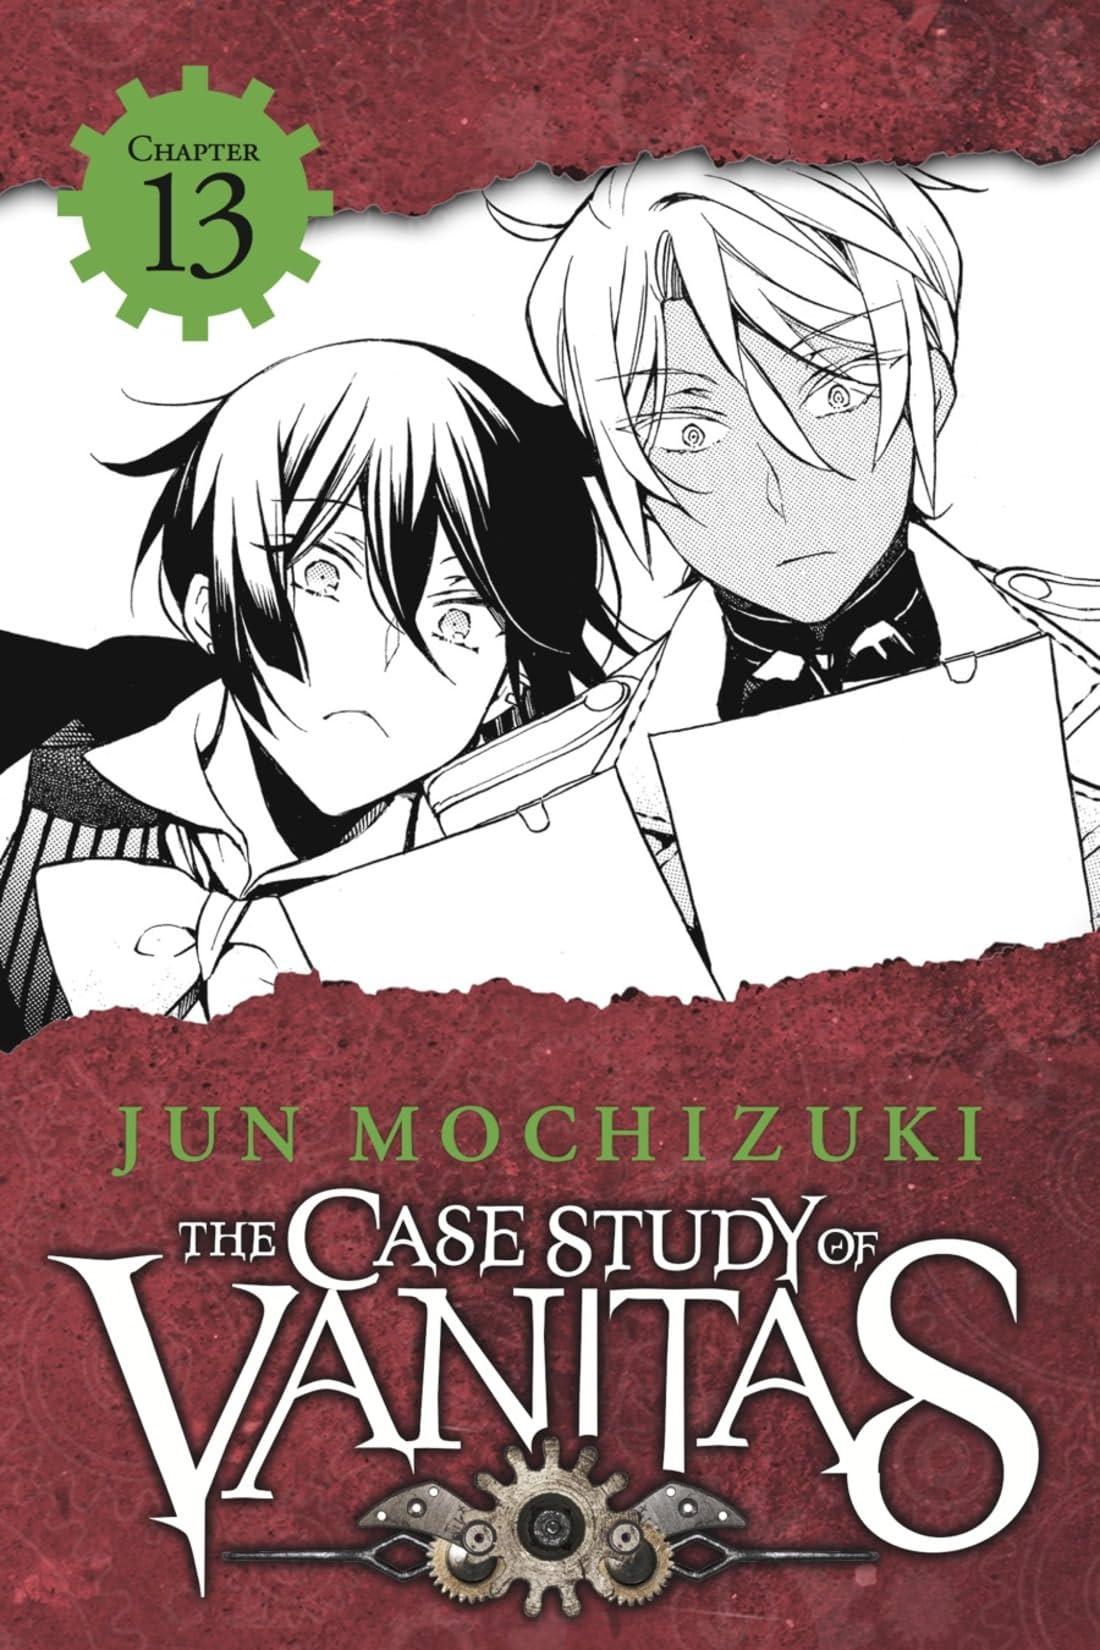 The Case Study of Vanitas #13